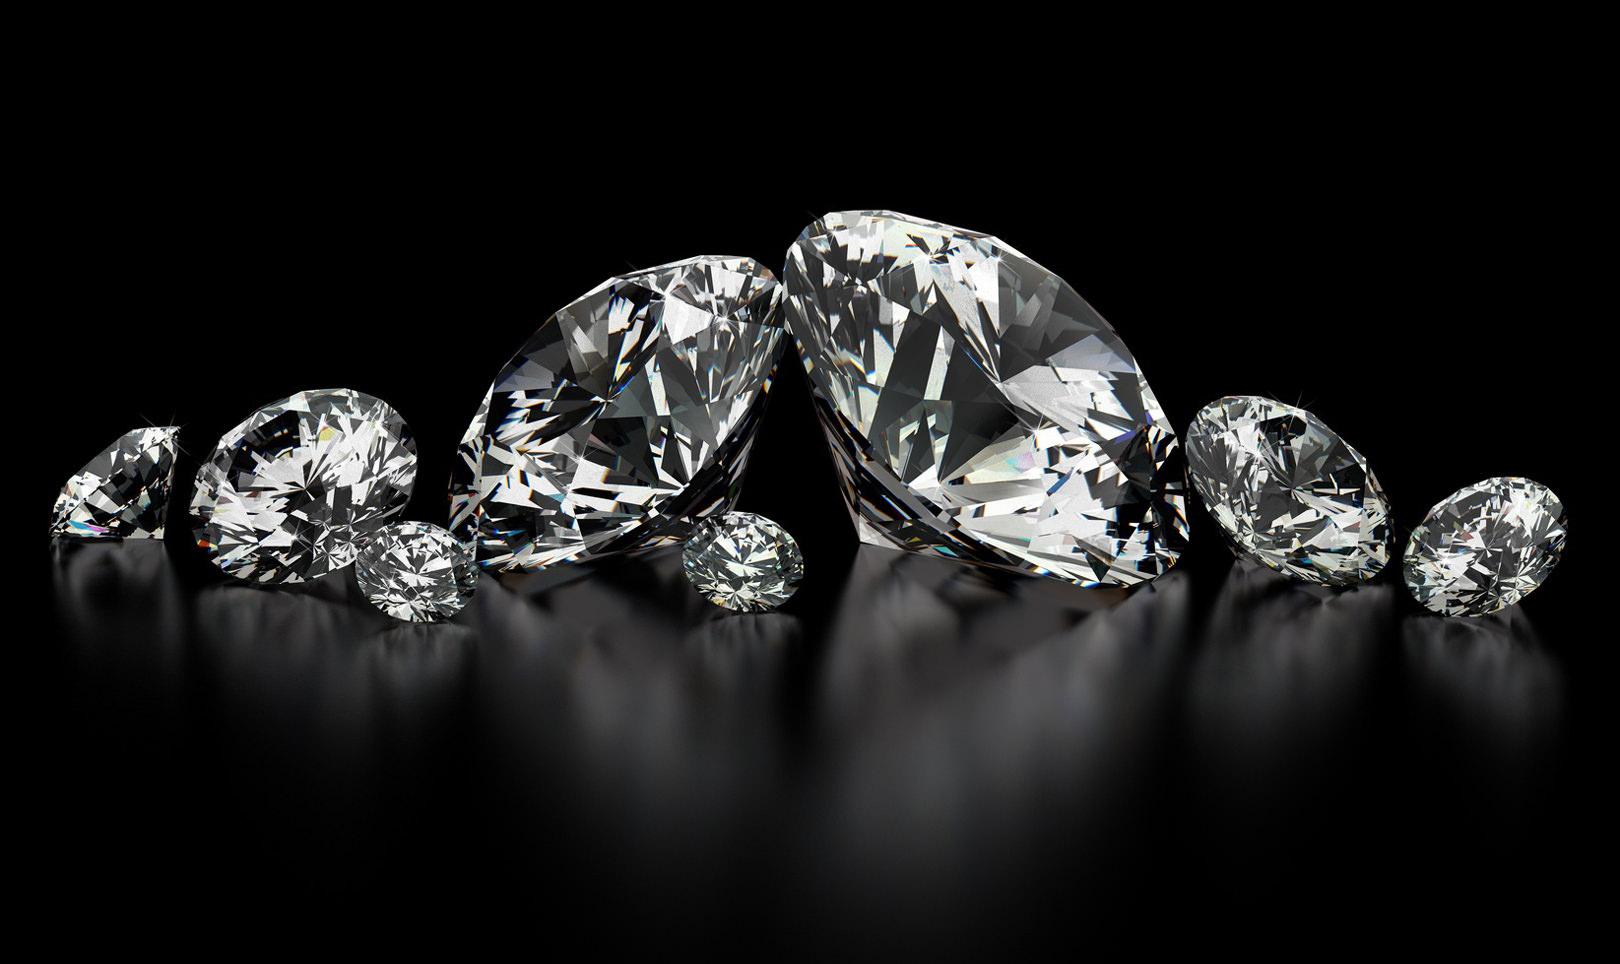 3d-printed-diamond-lockheed-martin-5